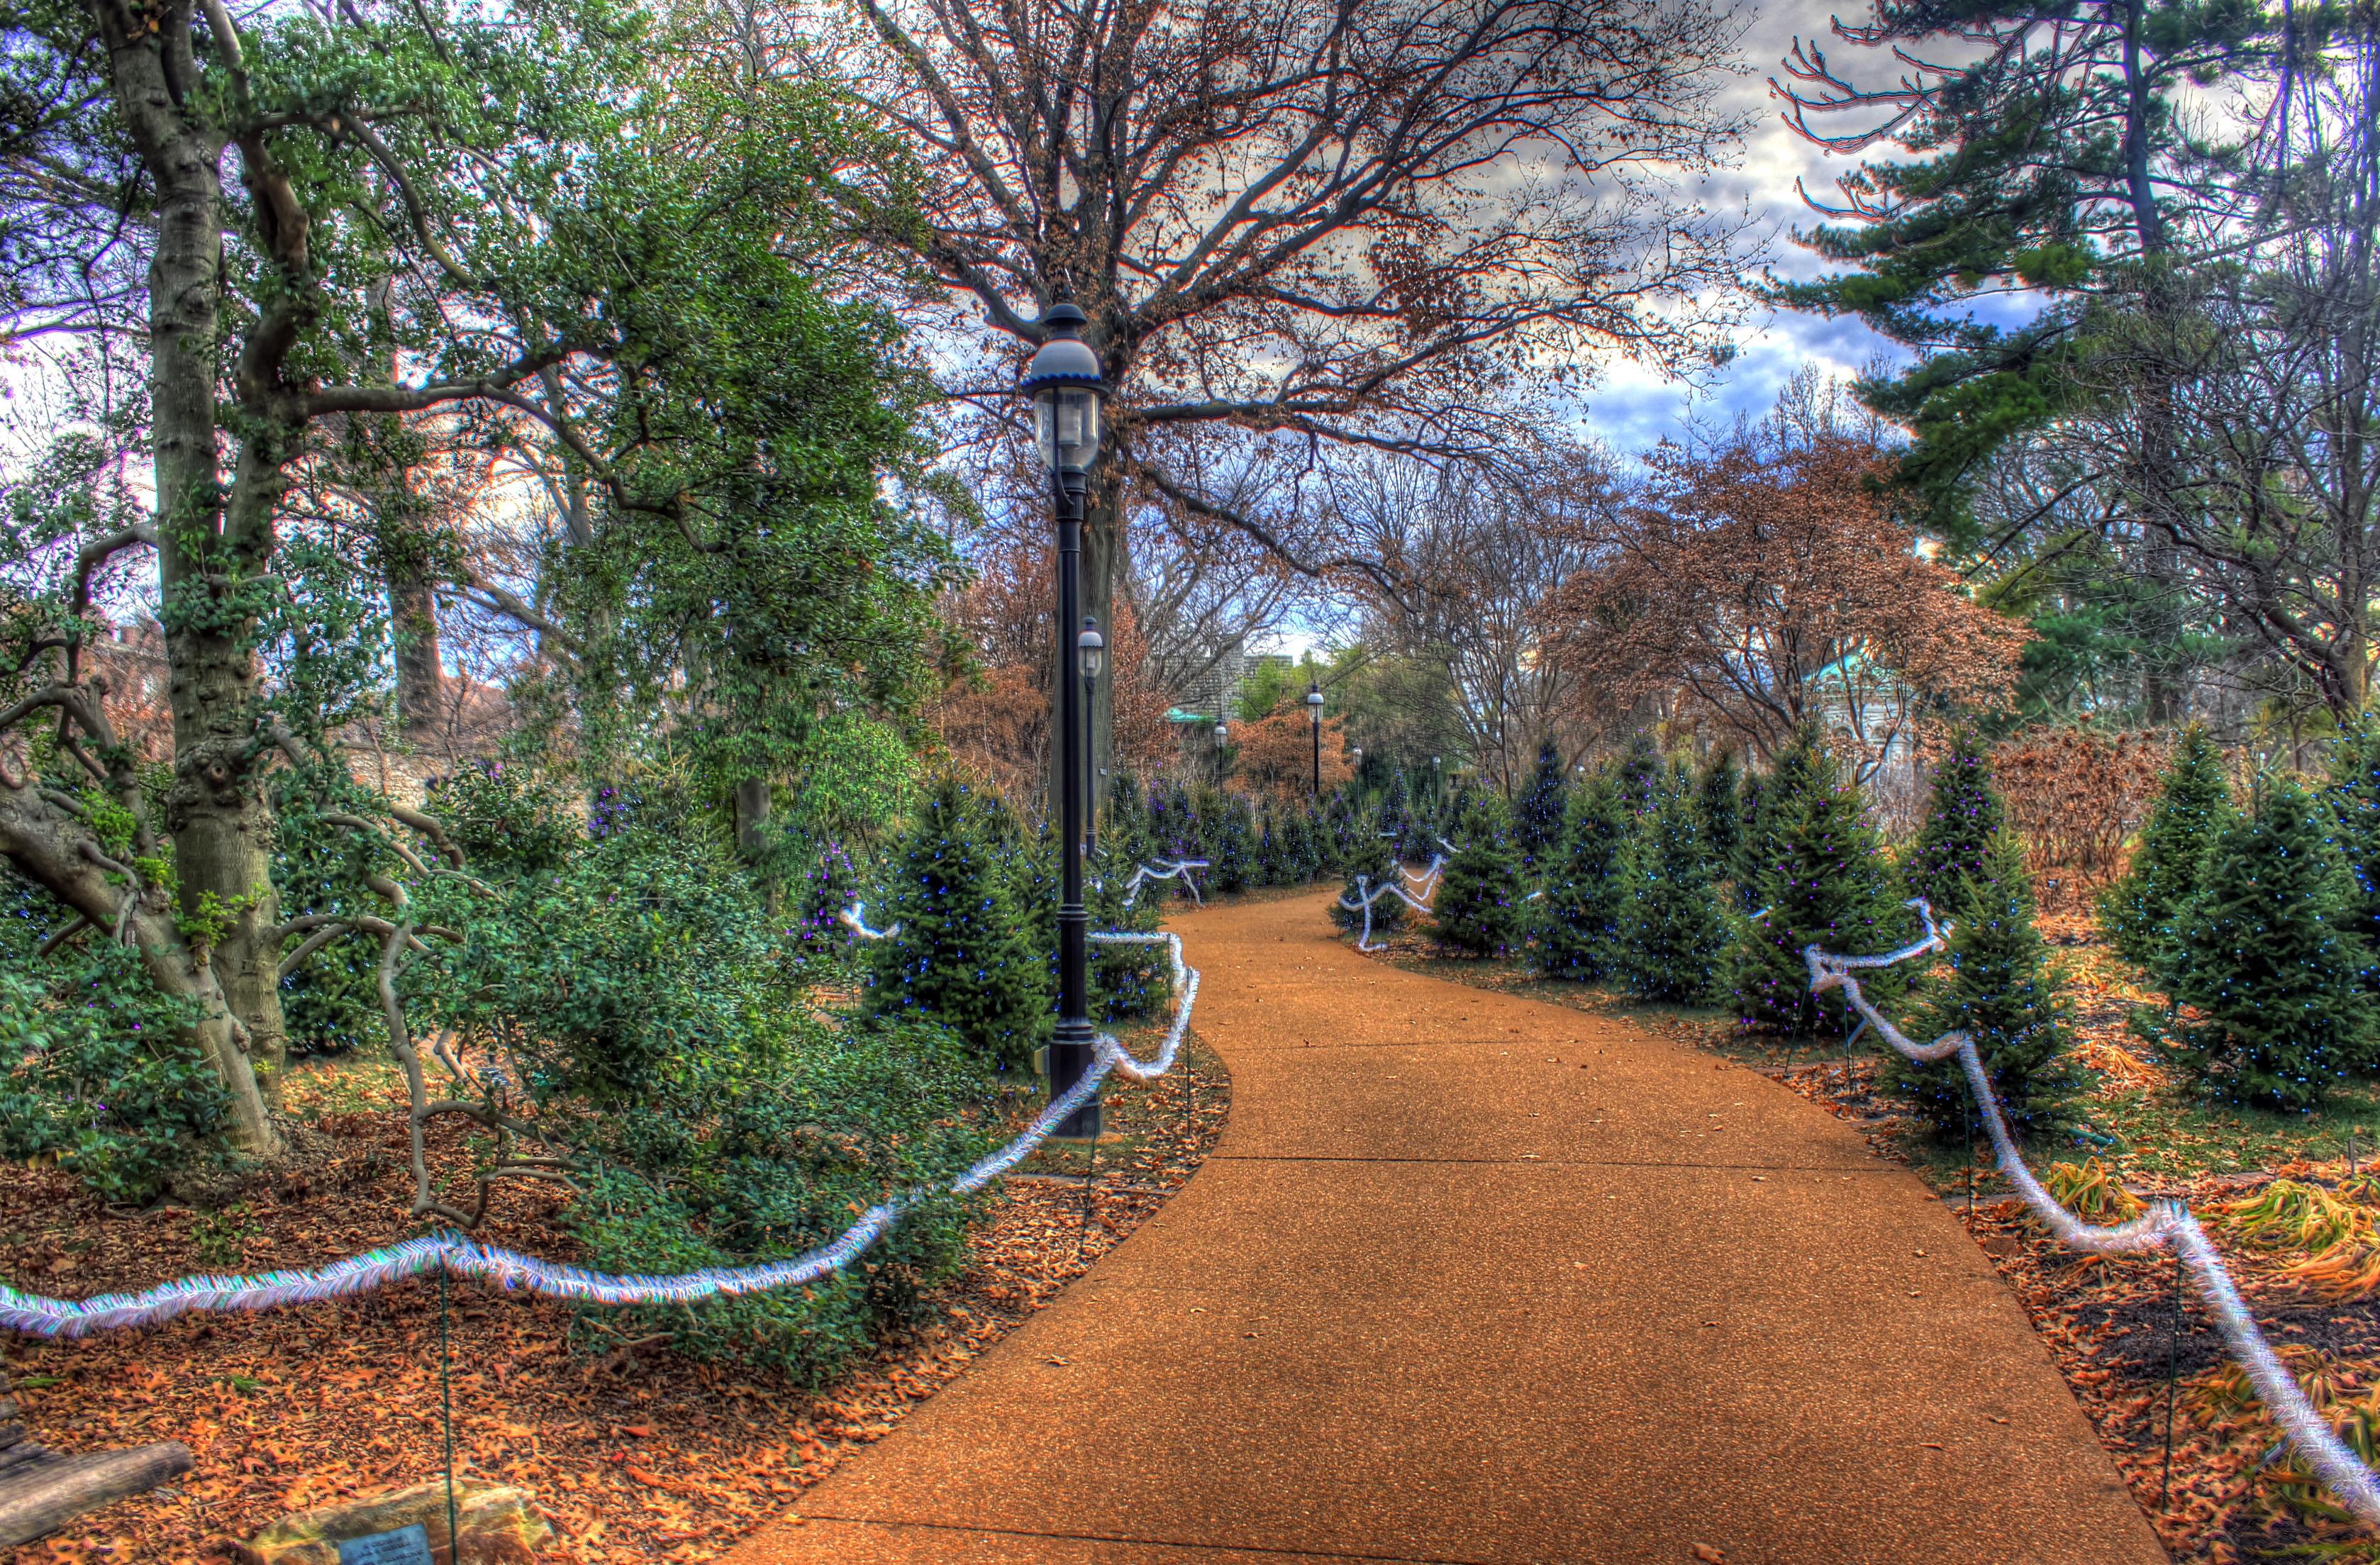 File Gfp St Louis Botanical Gardens Walkway In The Garden Jpg